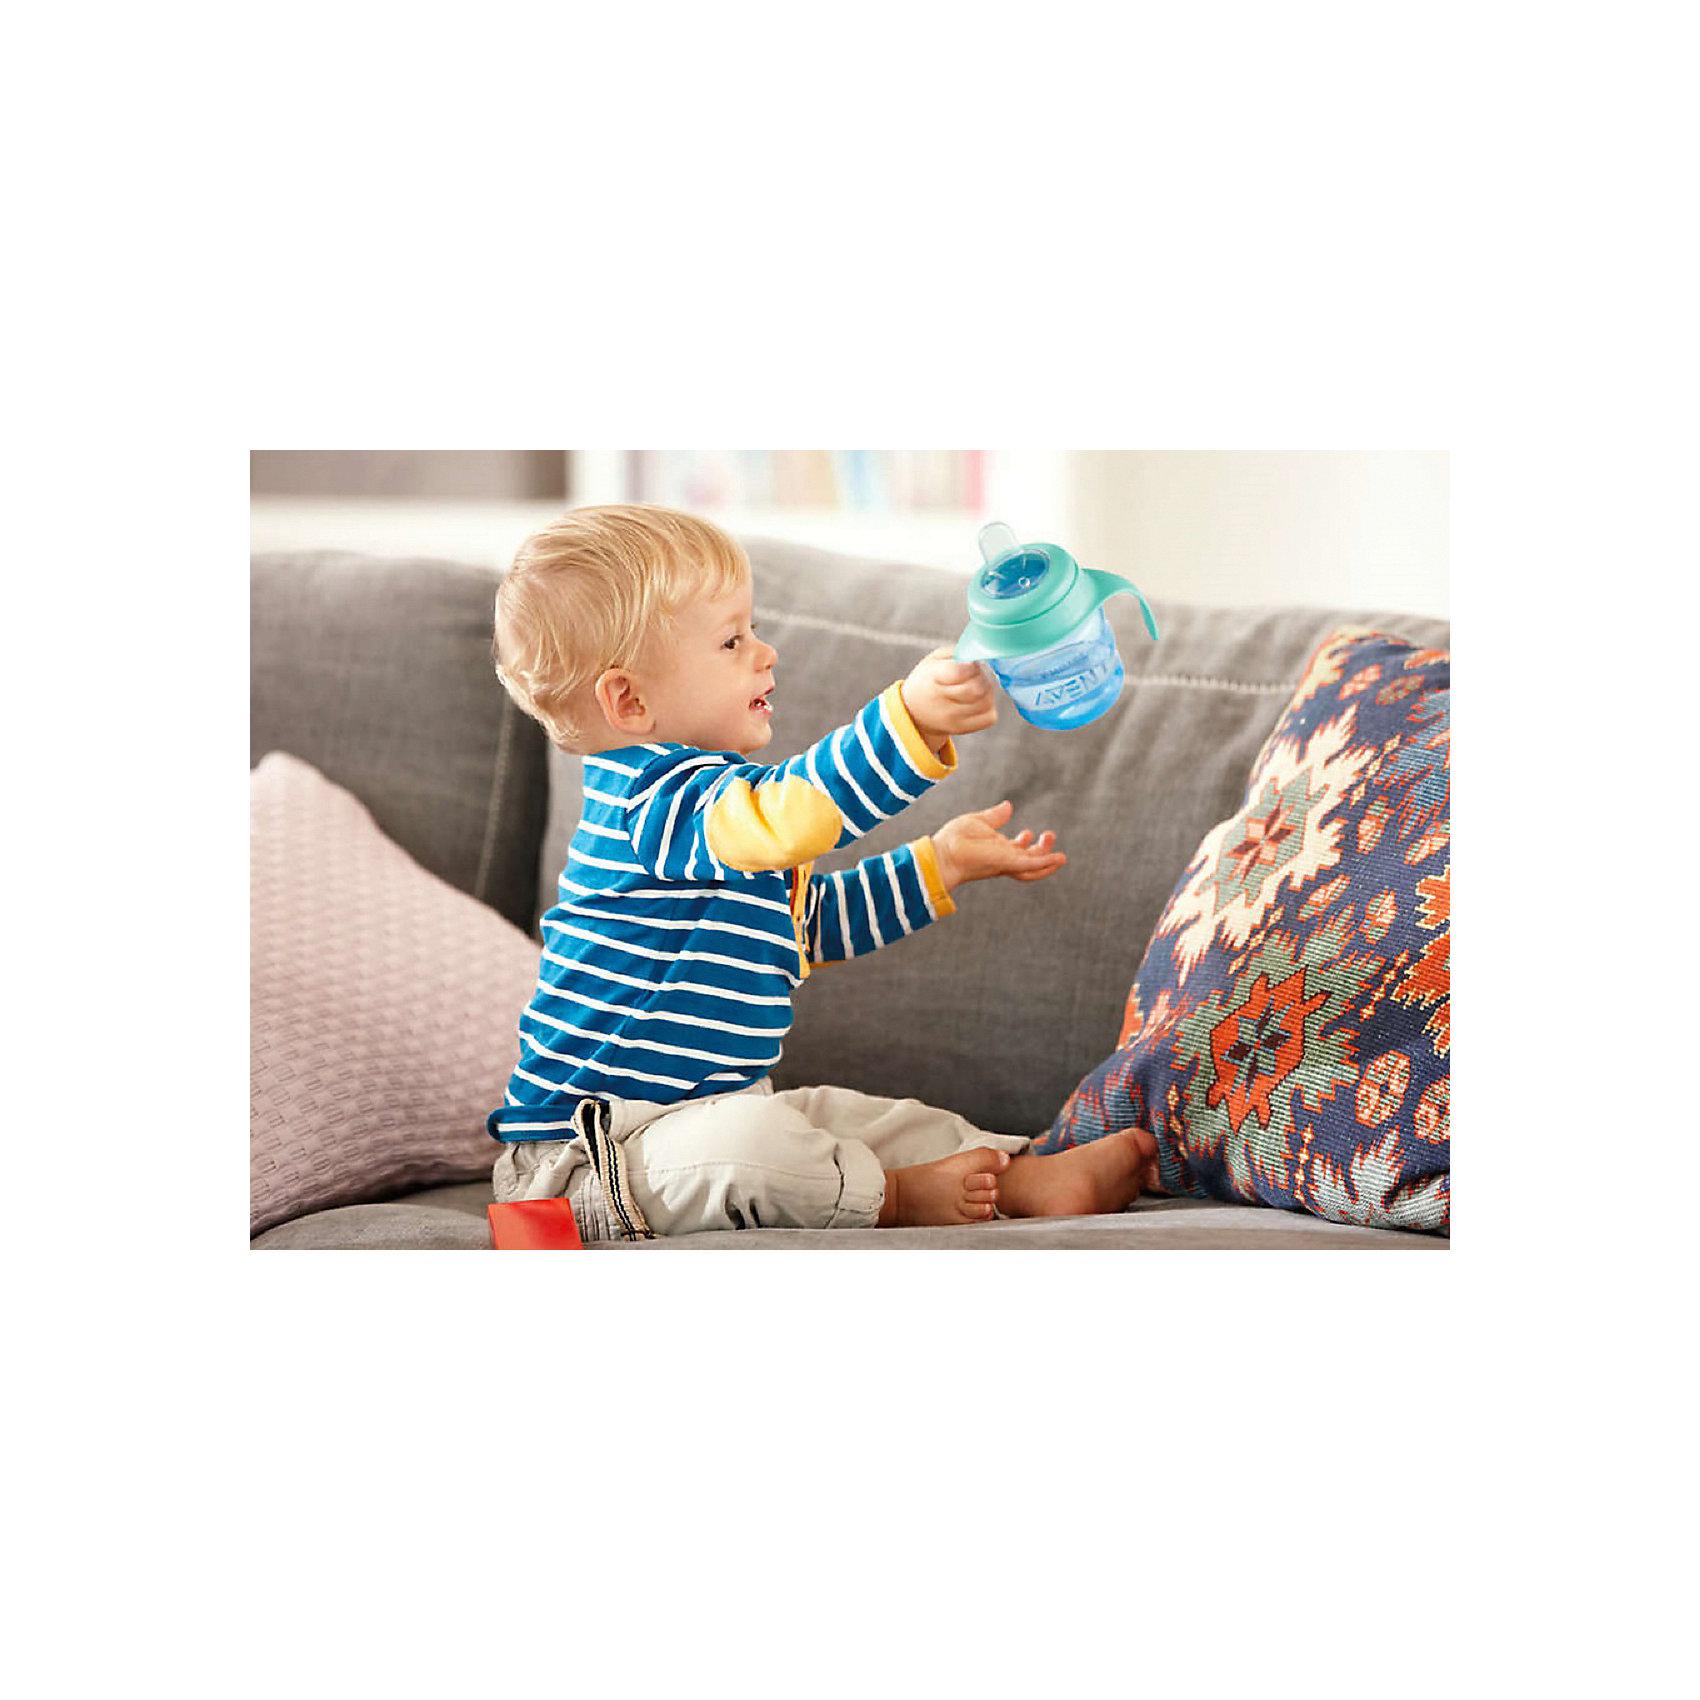 PHILIPS AVENT Чашка-поильник с носиком Comfort, 200 мл, Avent, голубой/зеленый